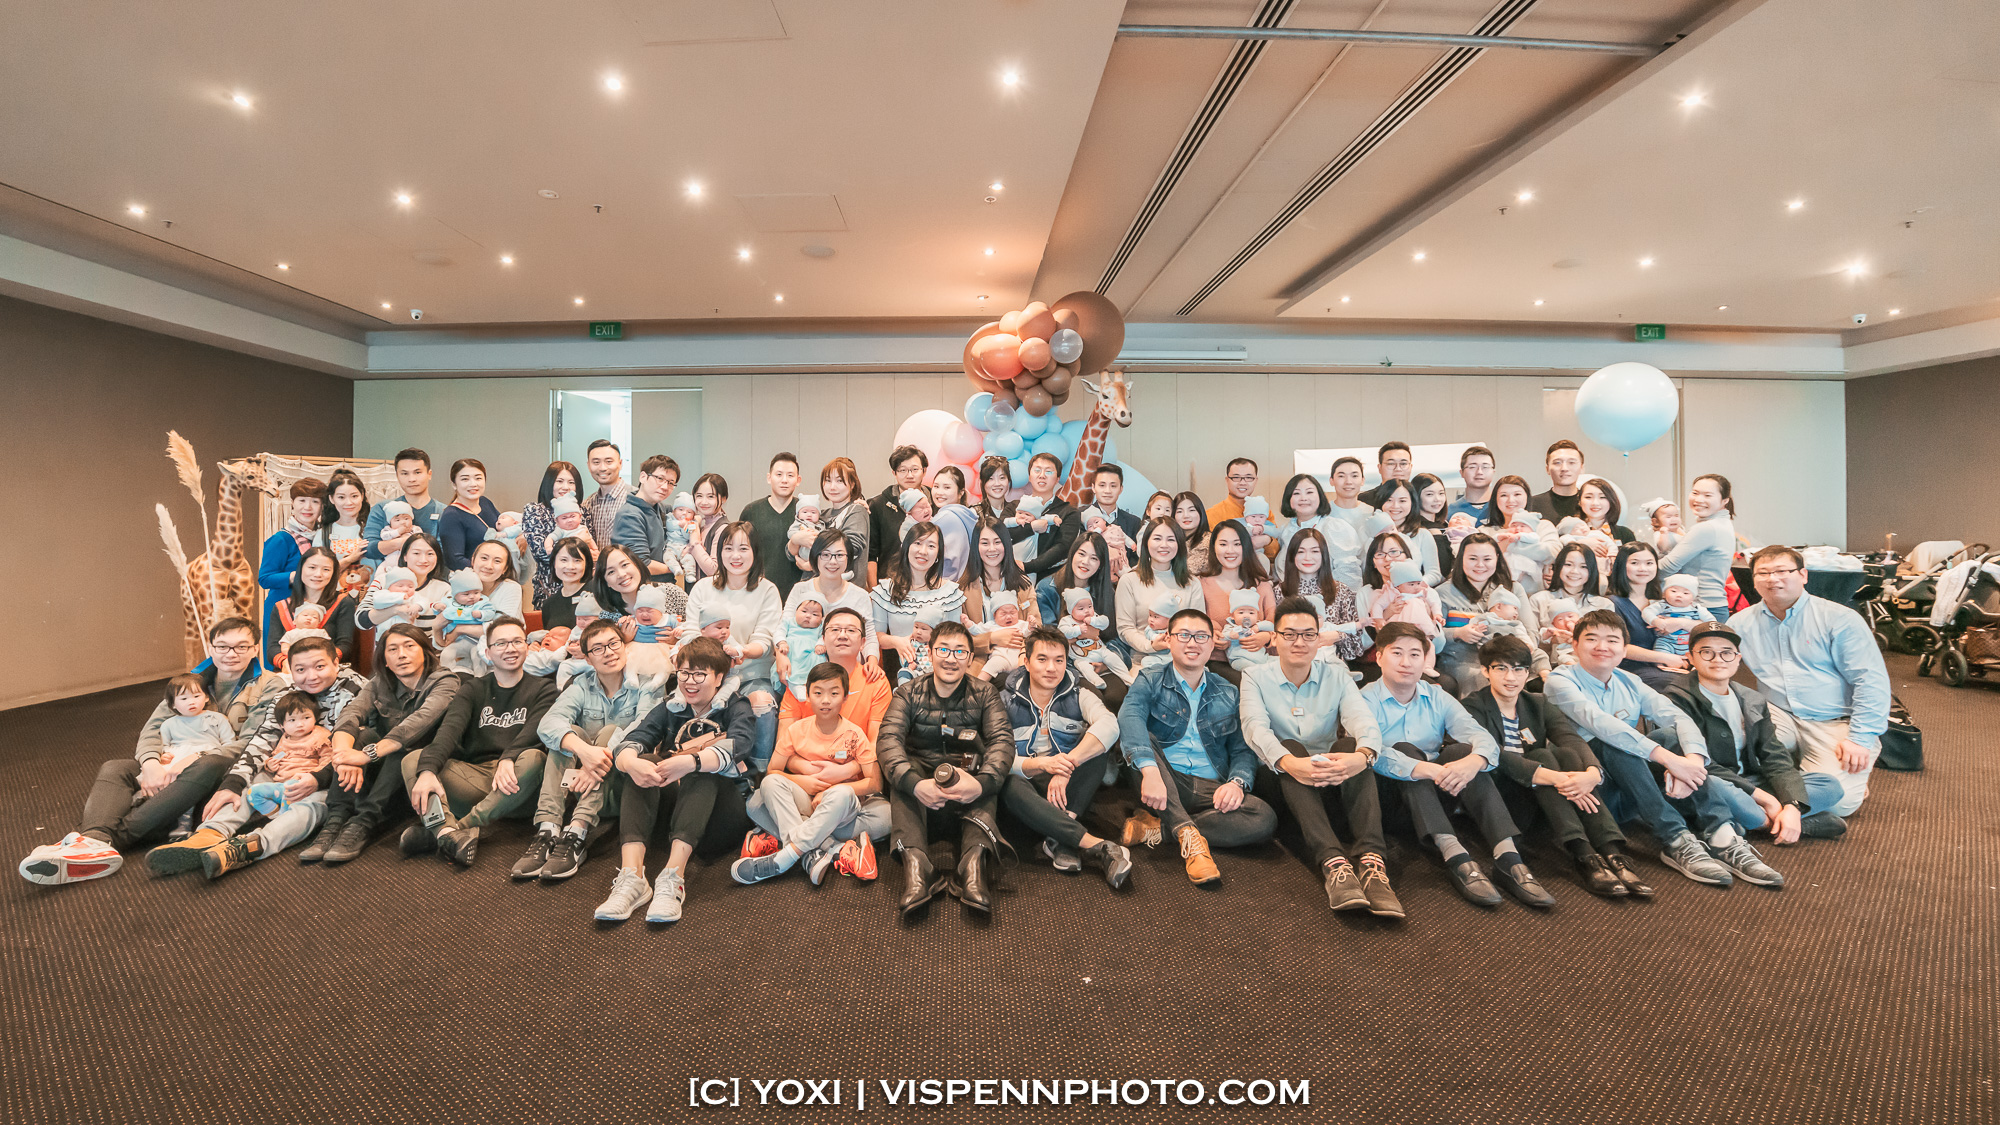 Melbourne Baby Family Birthday Party Photographer 墨尔本 百日宴 满月宴 周岁宴 摄影 VISPENN VISPENN 1177 Edit